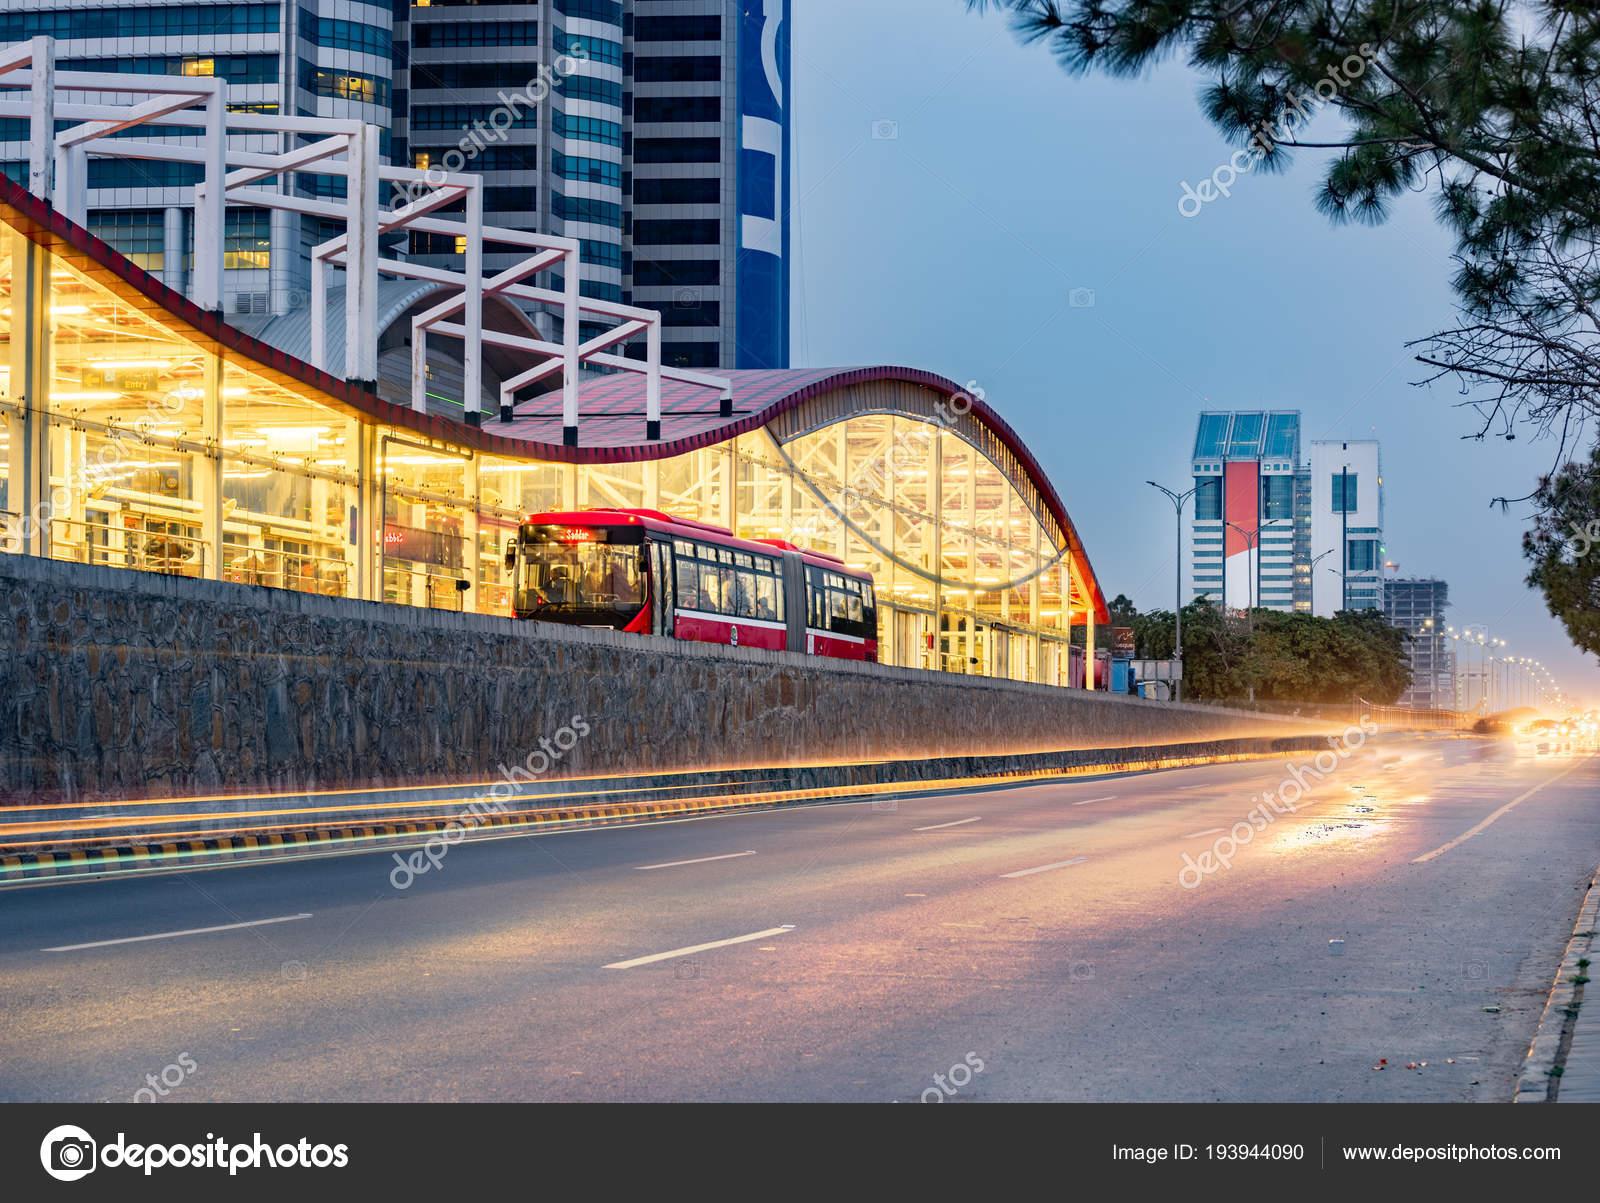 Metrobus Rawalpindi Islamabad Foi Construído 2015 Para